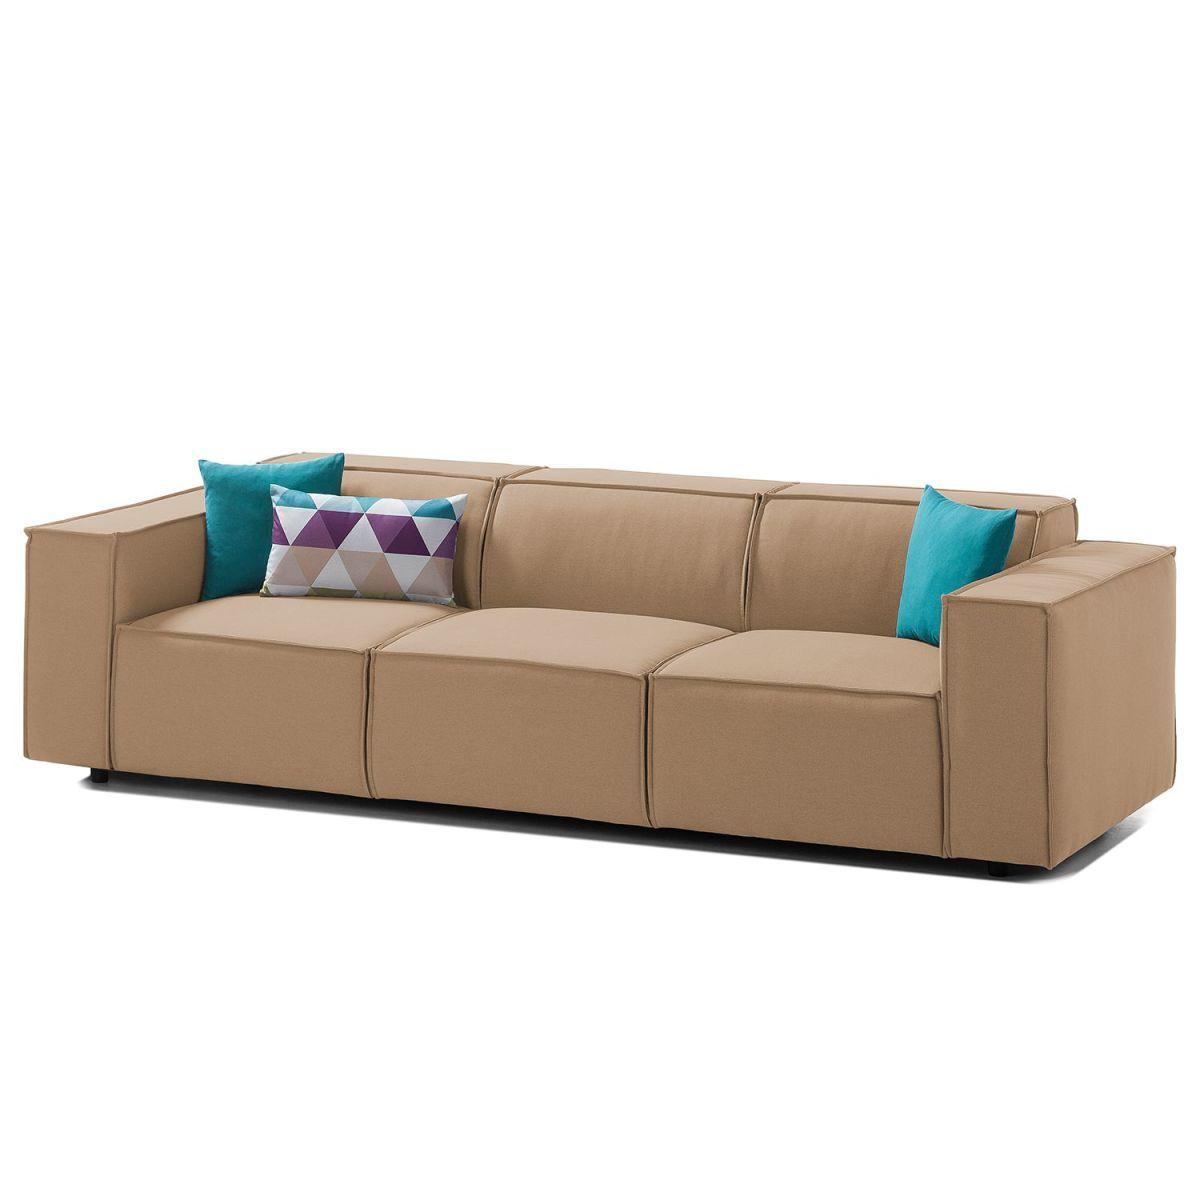 Sofa Kinx 3 Sitzer Webstoff Stoff Osta Cappuccino Kinx Jetzt Bestellen Unter Https Moebel Ladendir Sofas 3 Sitzer Sofa Sofa Mit Relaxfunktion